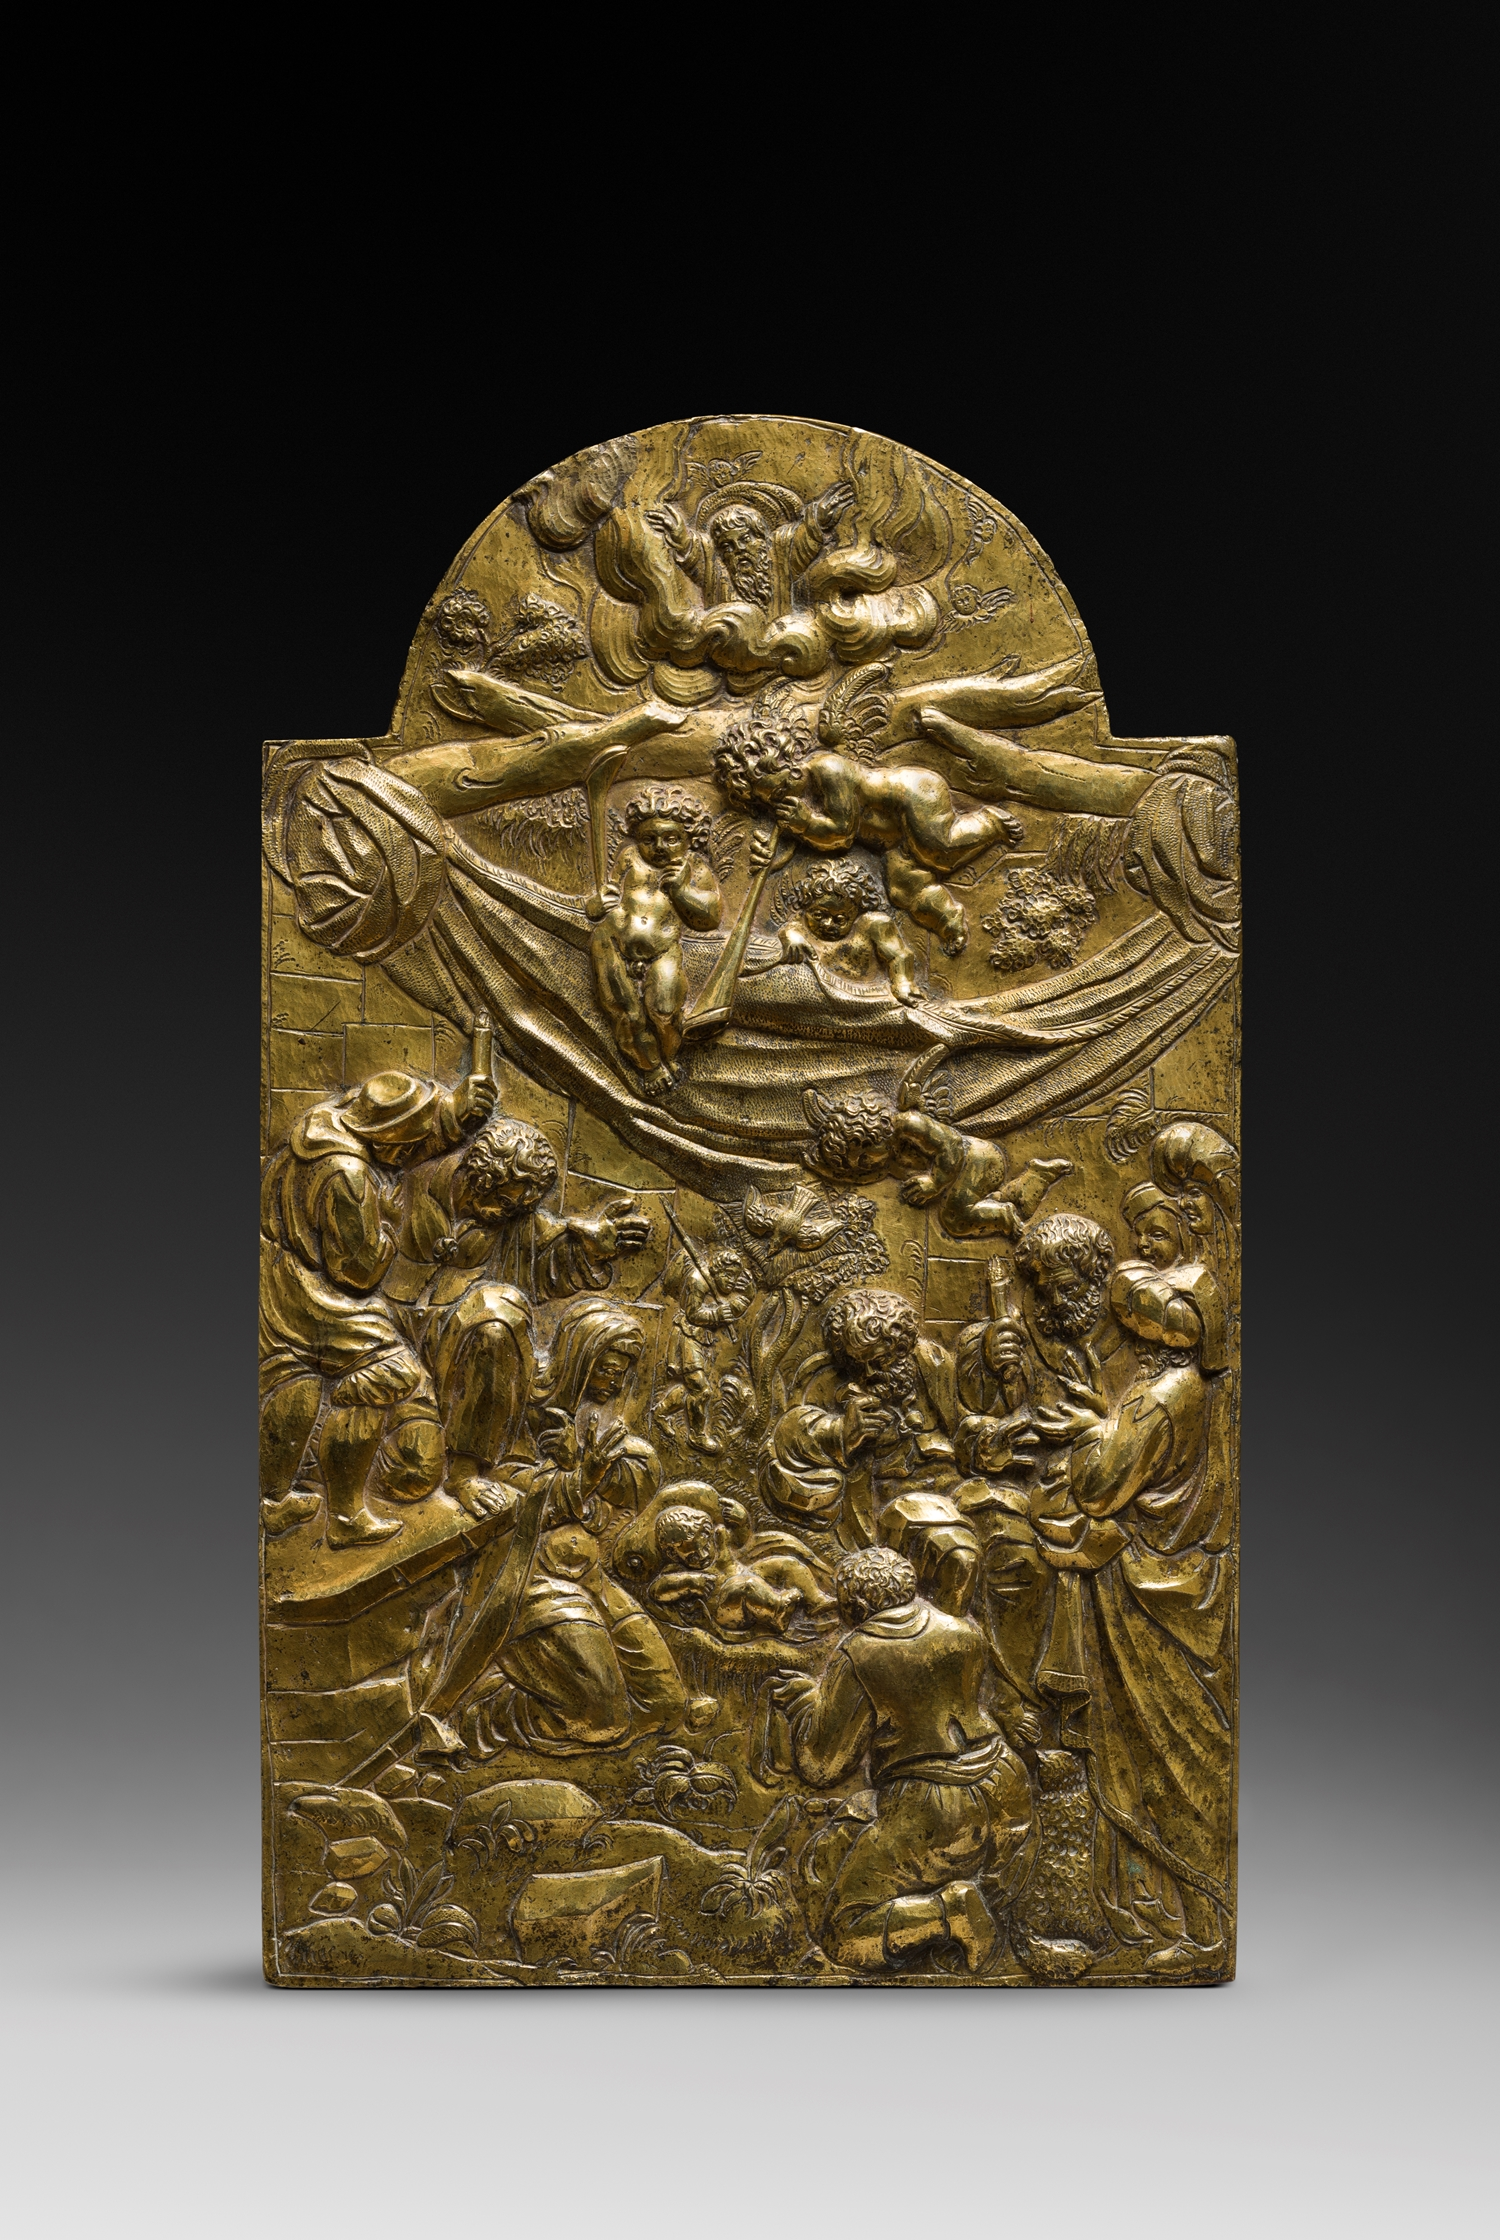 ARENT VAN BOLTEN ( 1573 - 1625 ) ADORATION OF THE SHEPHERDS